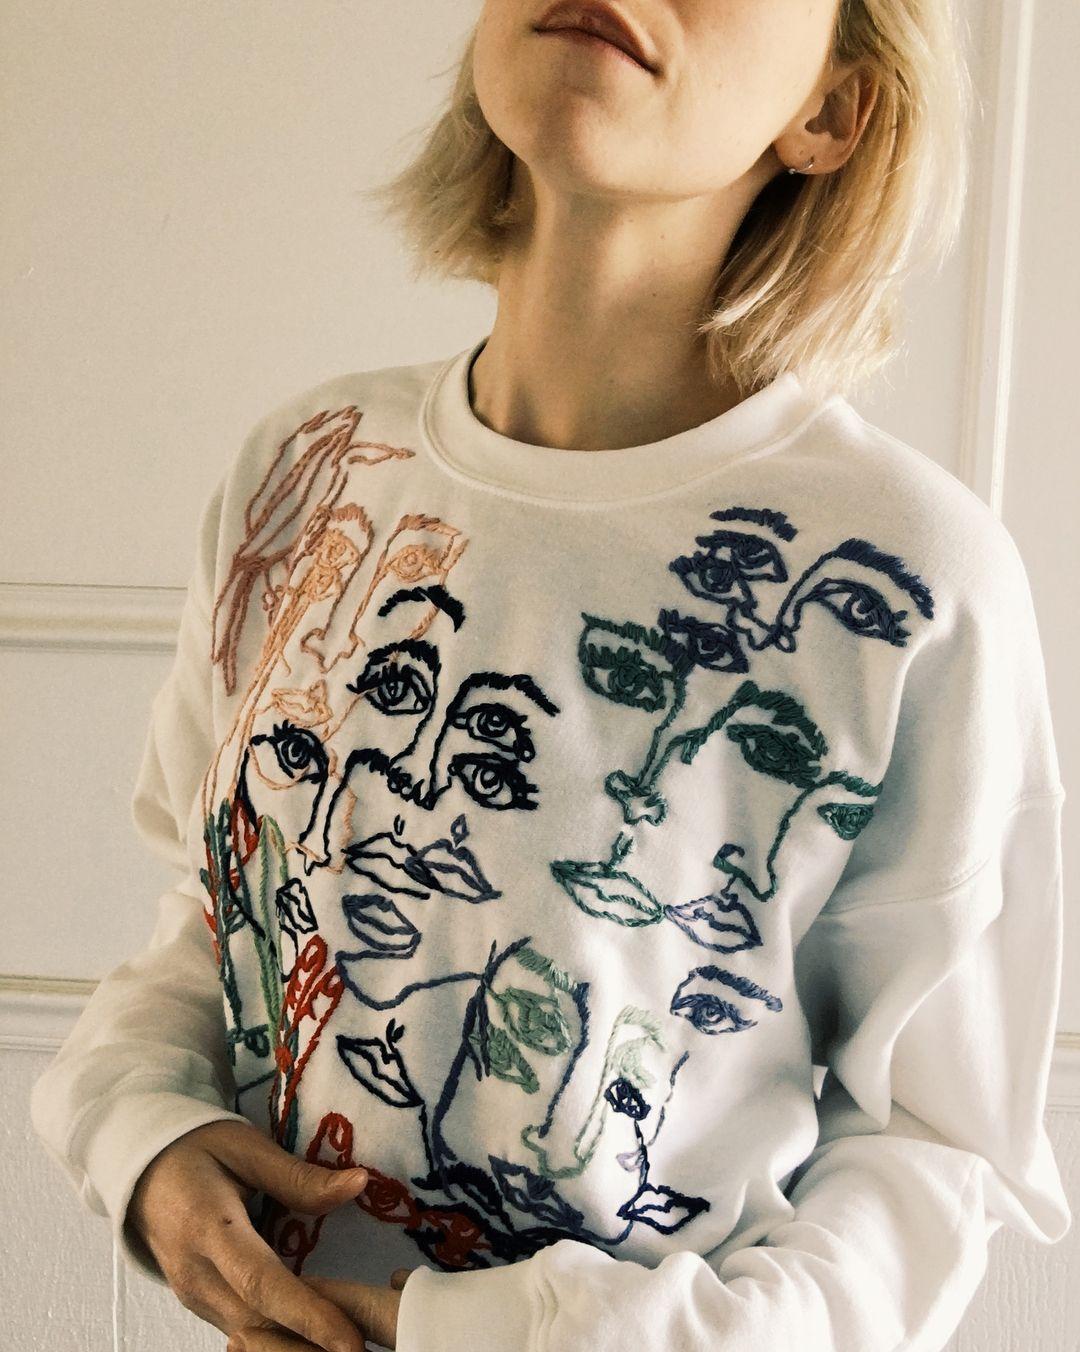 "19.8k Likes, 448 Comments - ⚡️Tessa⚡️ (@tessa_perlow) on Instagram: ""Contour sweatshirt #embroidery"""